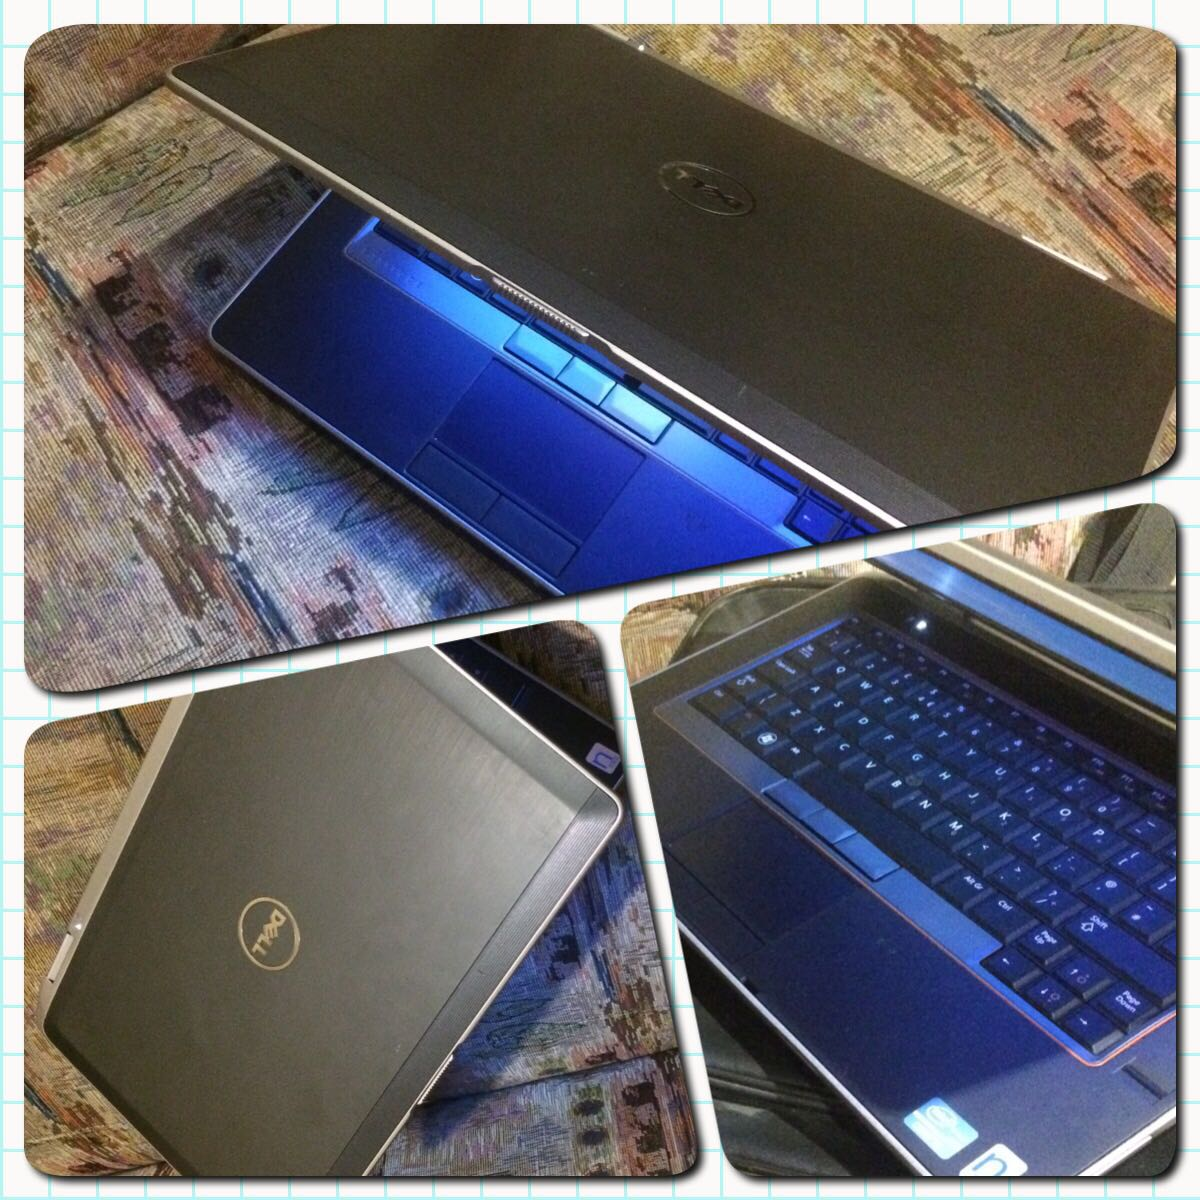 Dell-Latitude E6420 <br />\r\nPro:i5 2.5GHz <br />\r\nRam:6GB <br />\r\nVga:2GB <br />\r\nScreen:14 <br />\r\nHdd:500GB <br />\r\nTam professional olan bu noutbuk boz rengdedir...